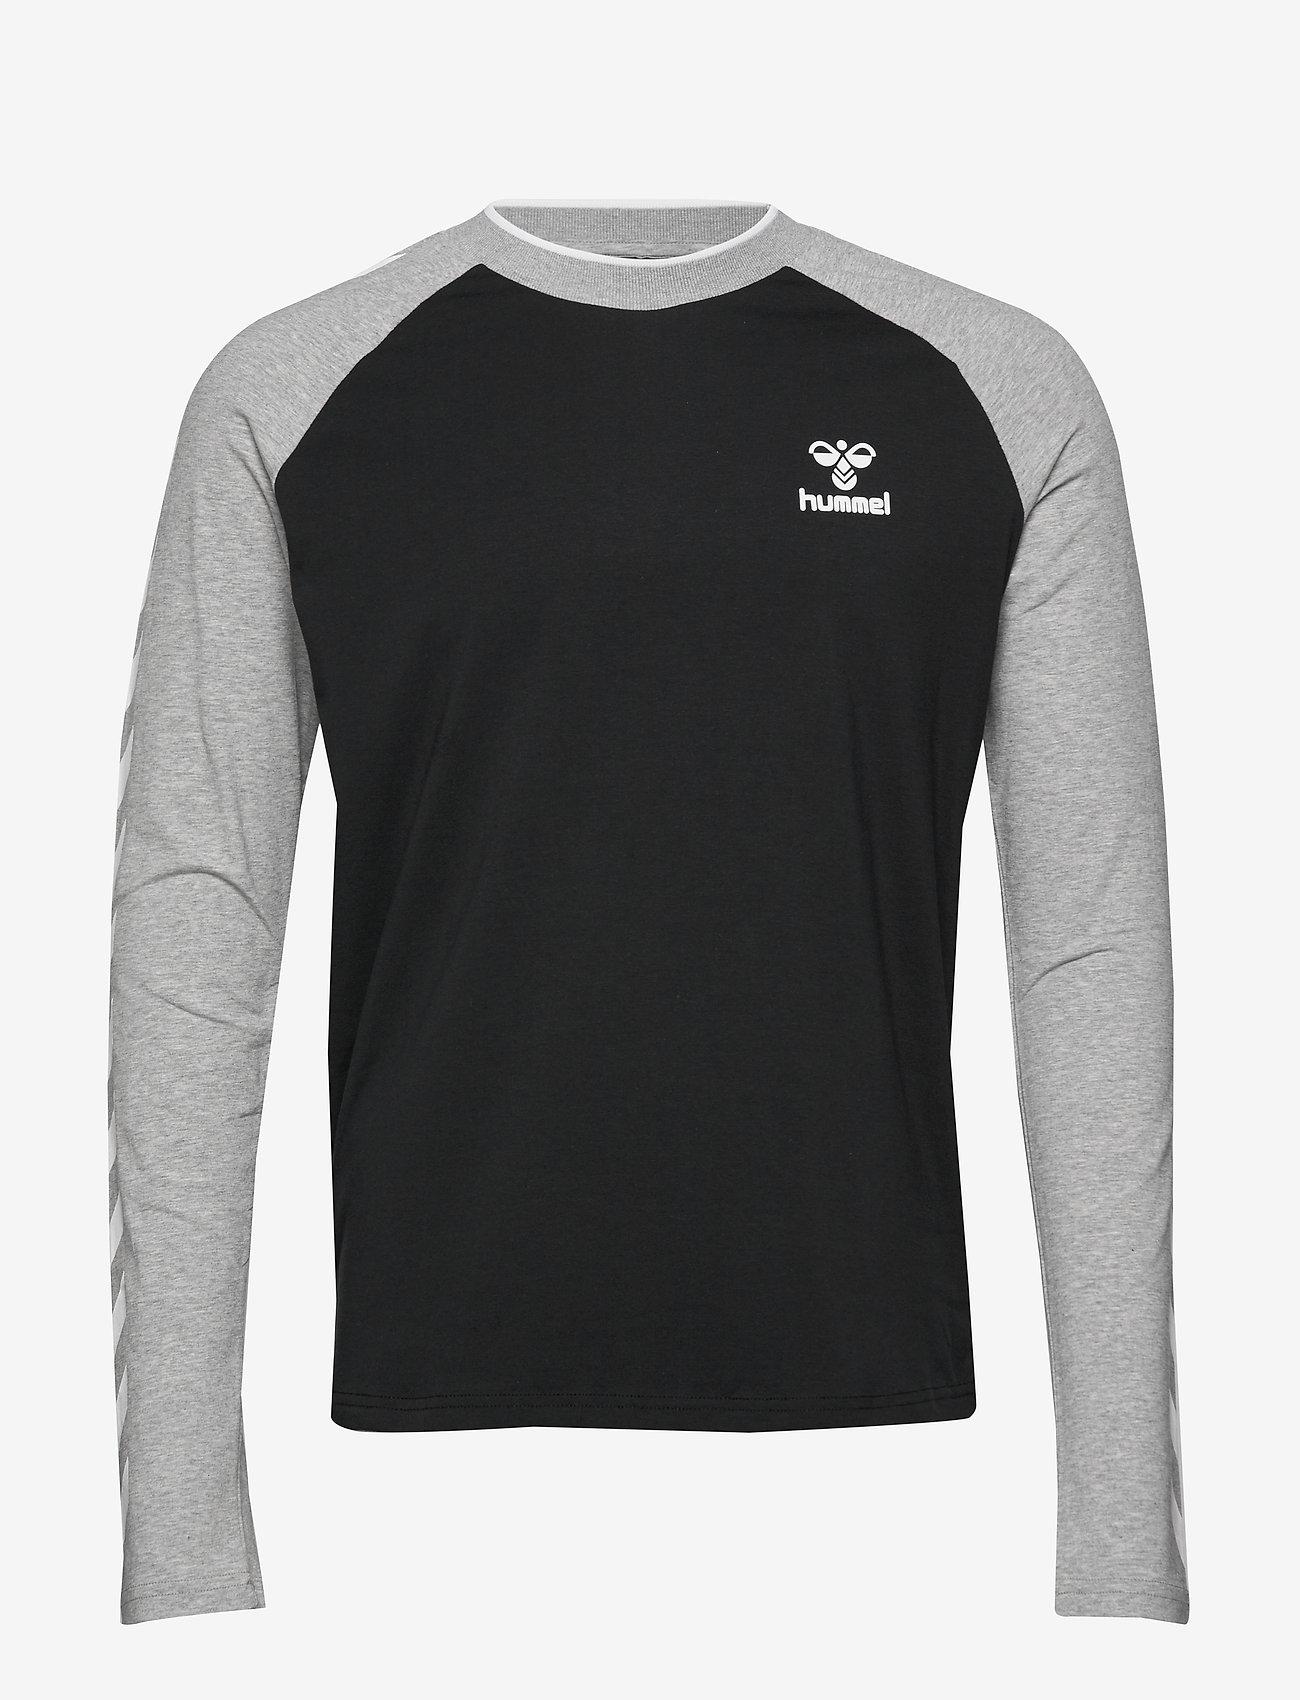 Hummel - hmlMARK T-SHIRT L/S - bluzki z długim rękawem - black - 0